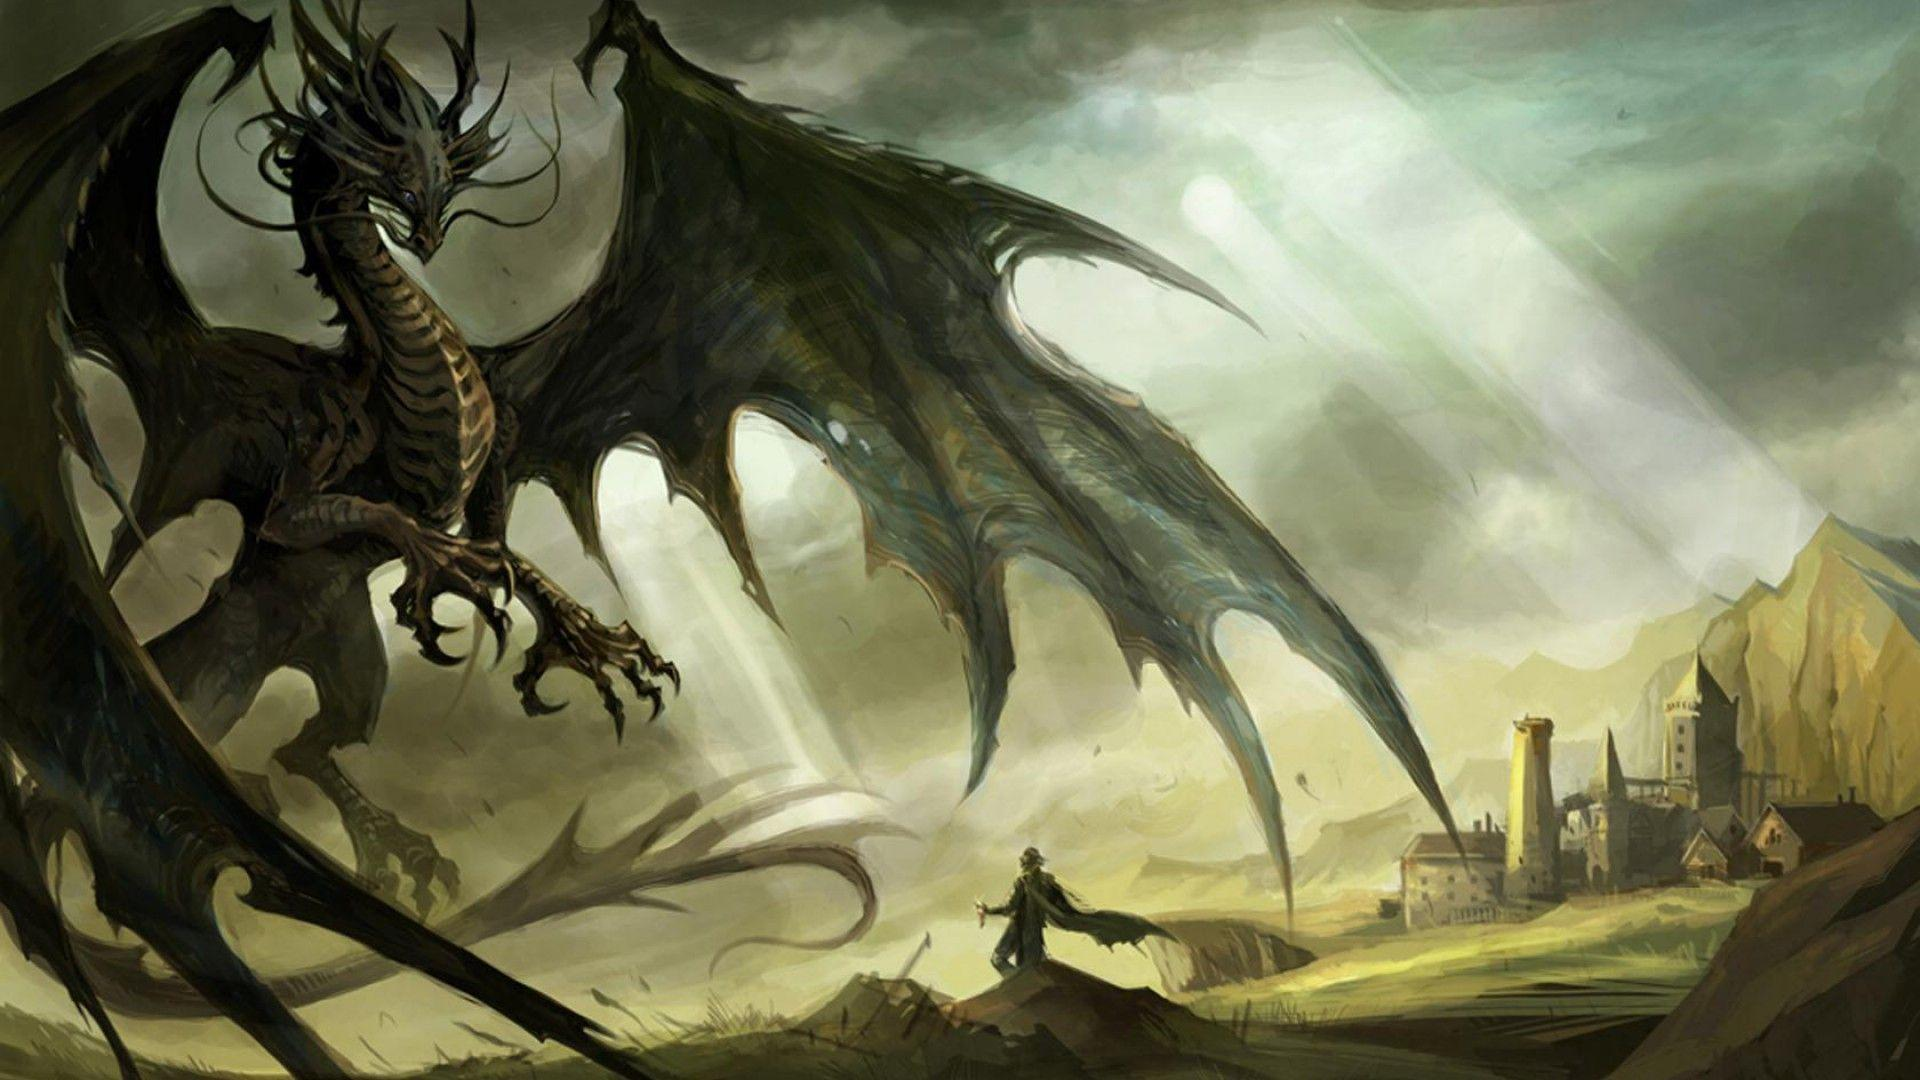 dragon wallpaper widescreen high resolution - photo #5